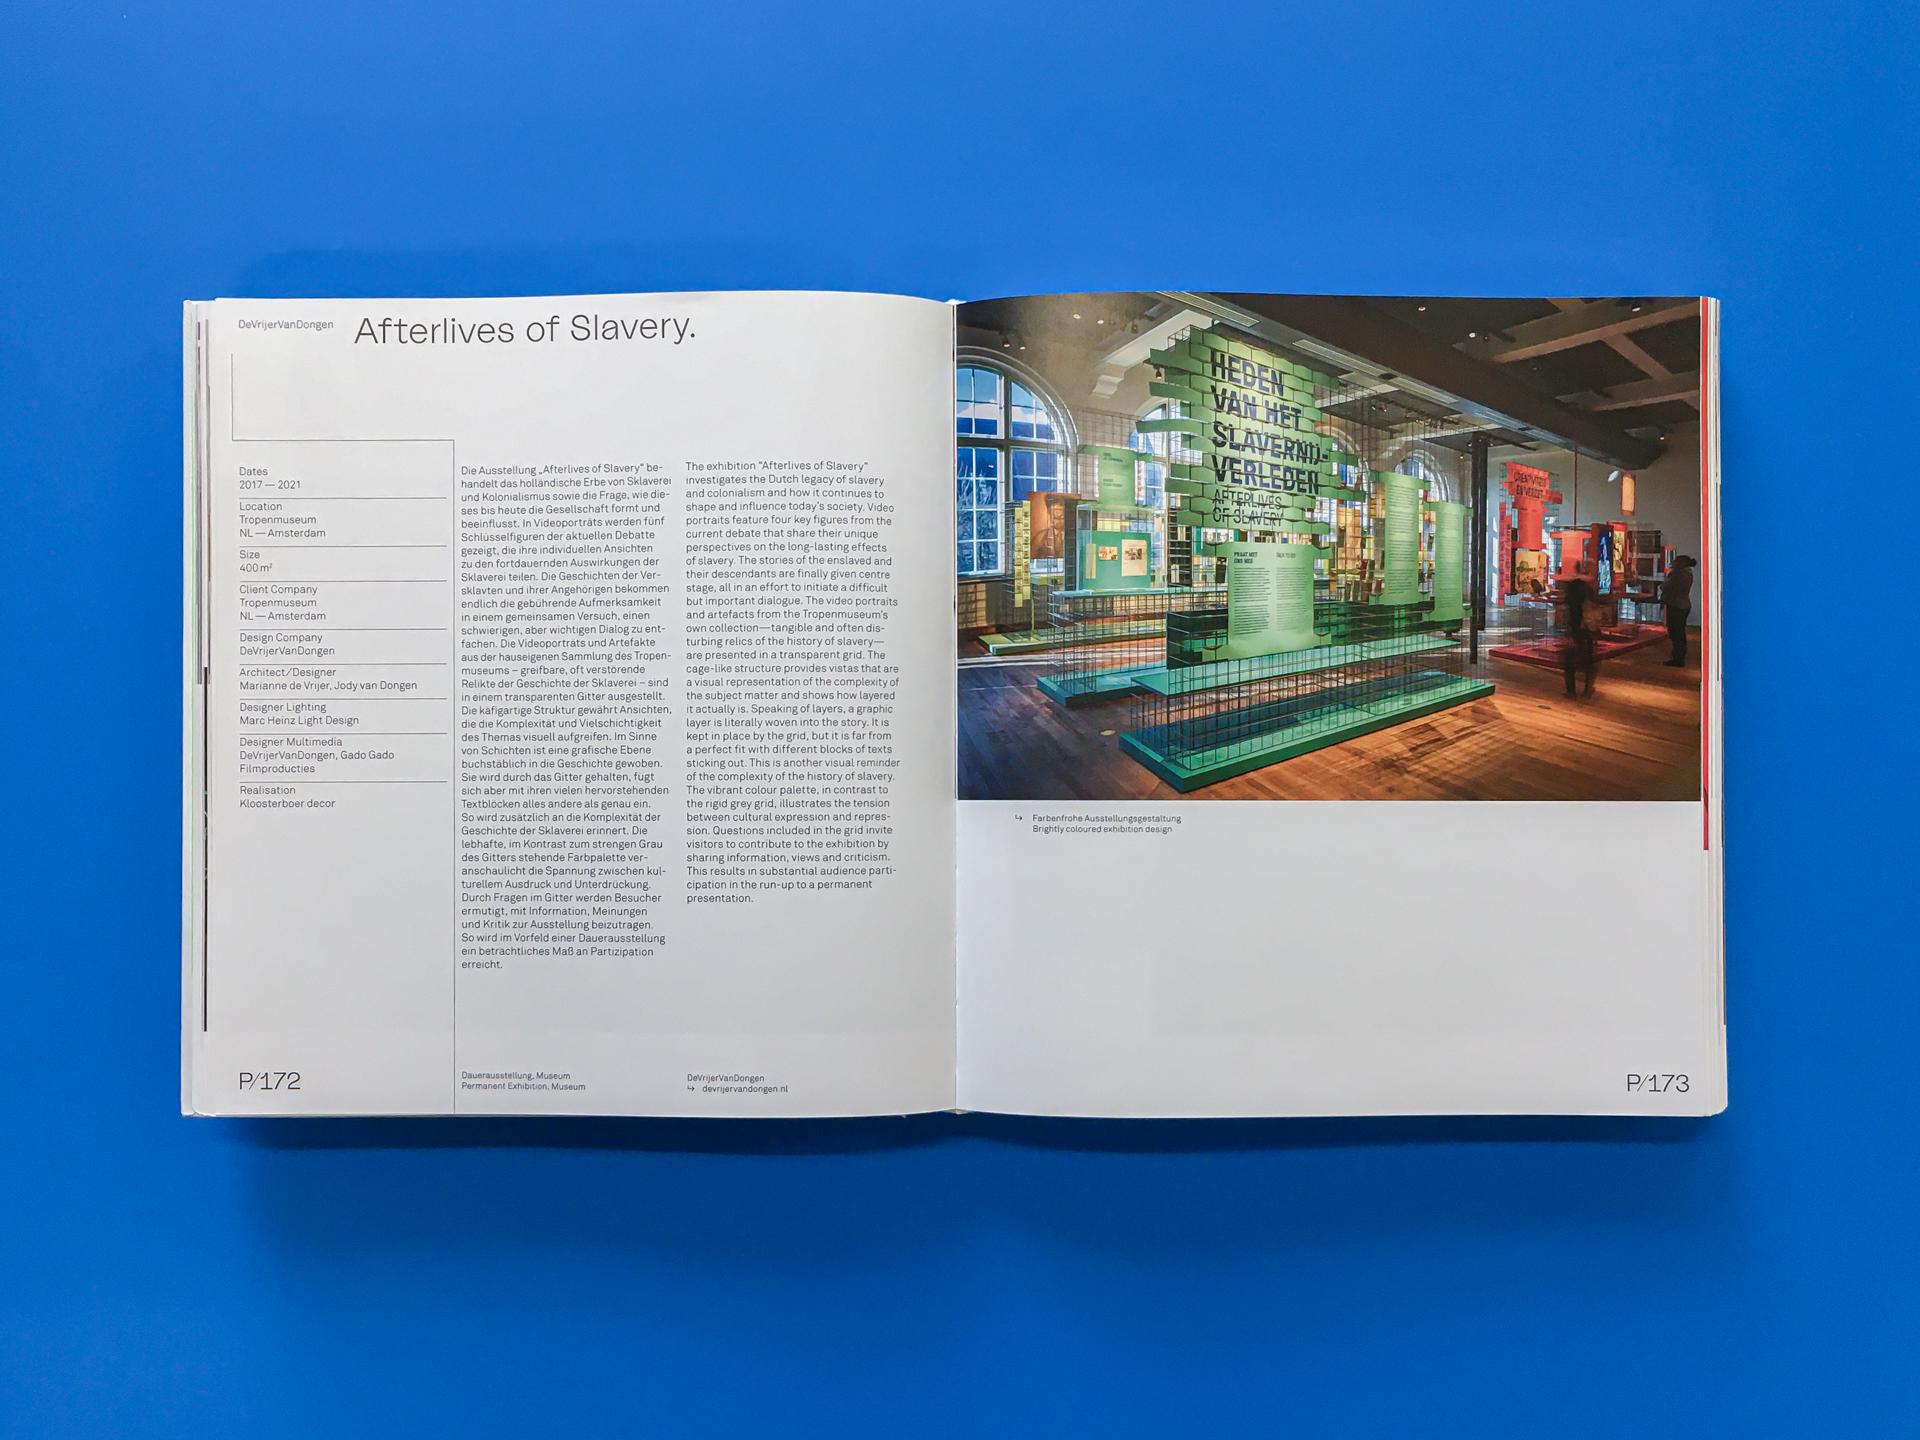 dvvd tm new exhibition design 03 book 2 jpg